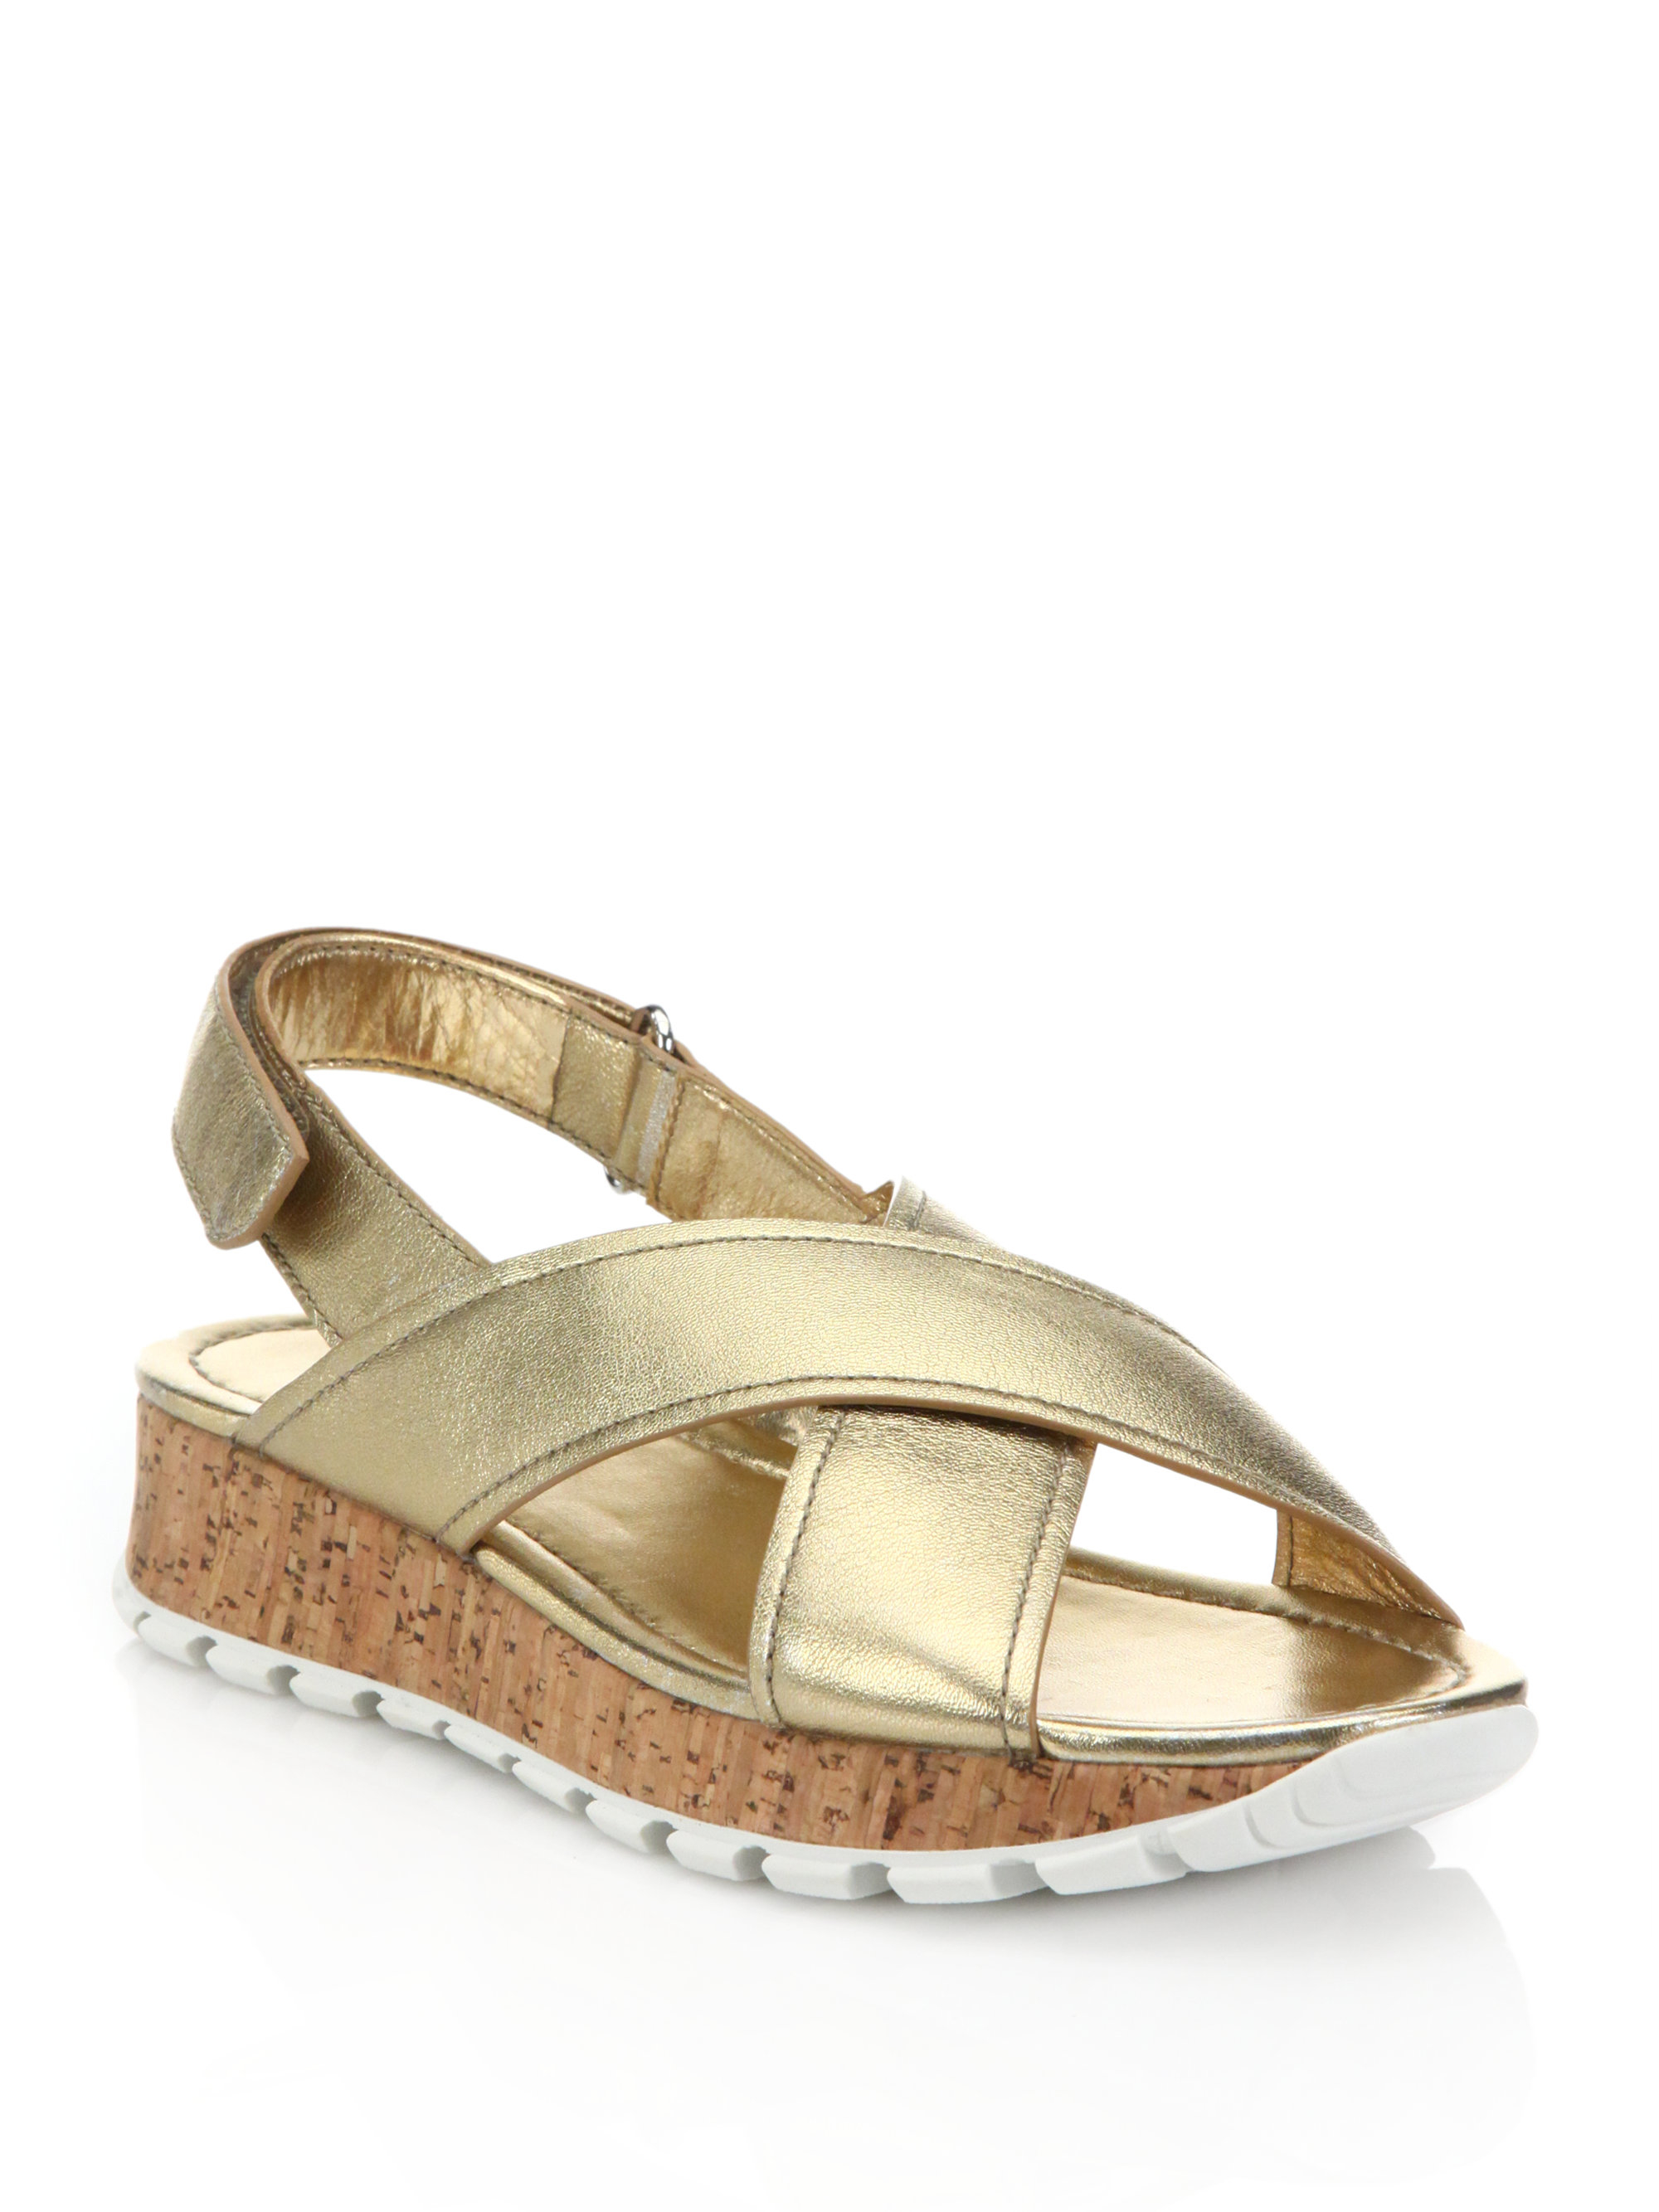 best replica prada bags - Prada Metallic Leather Cork Sandals in Gold   Lyst